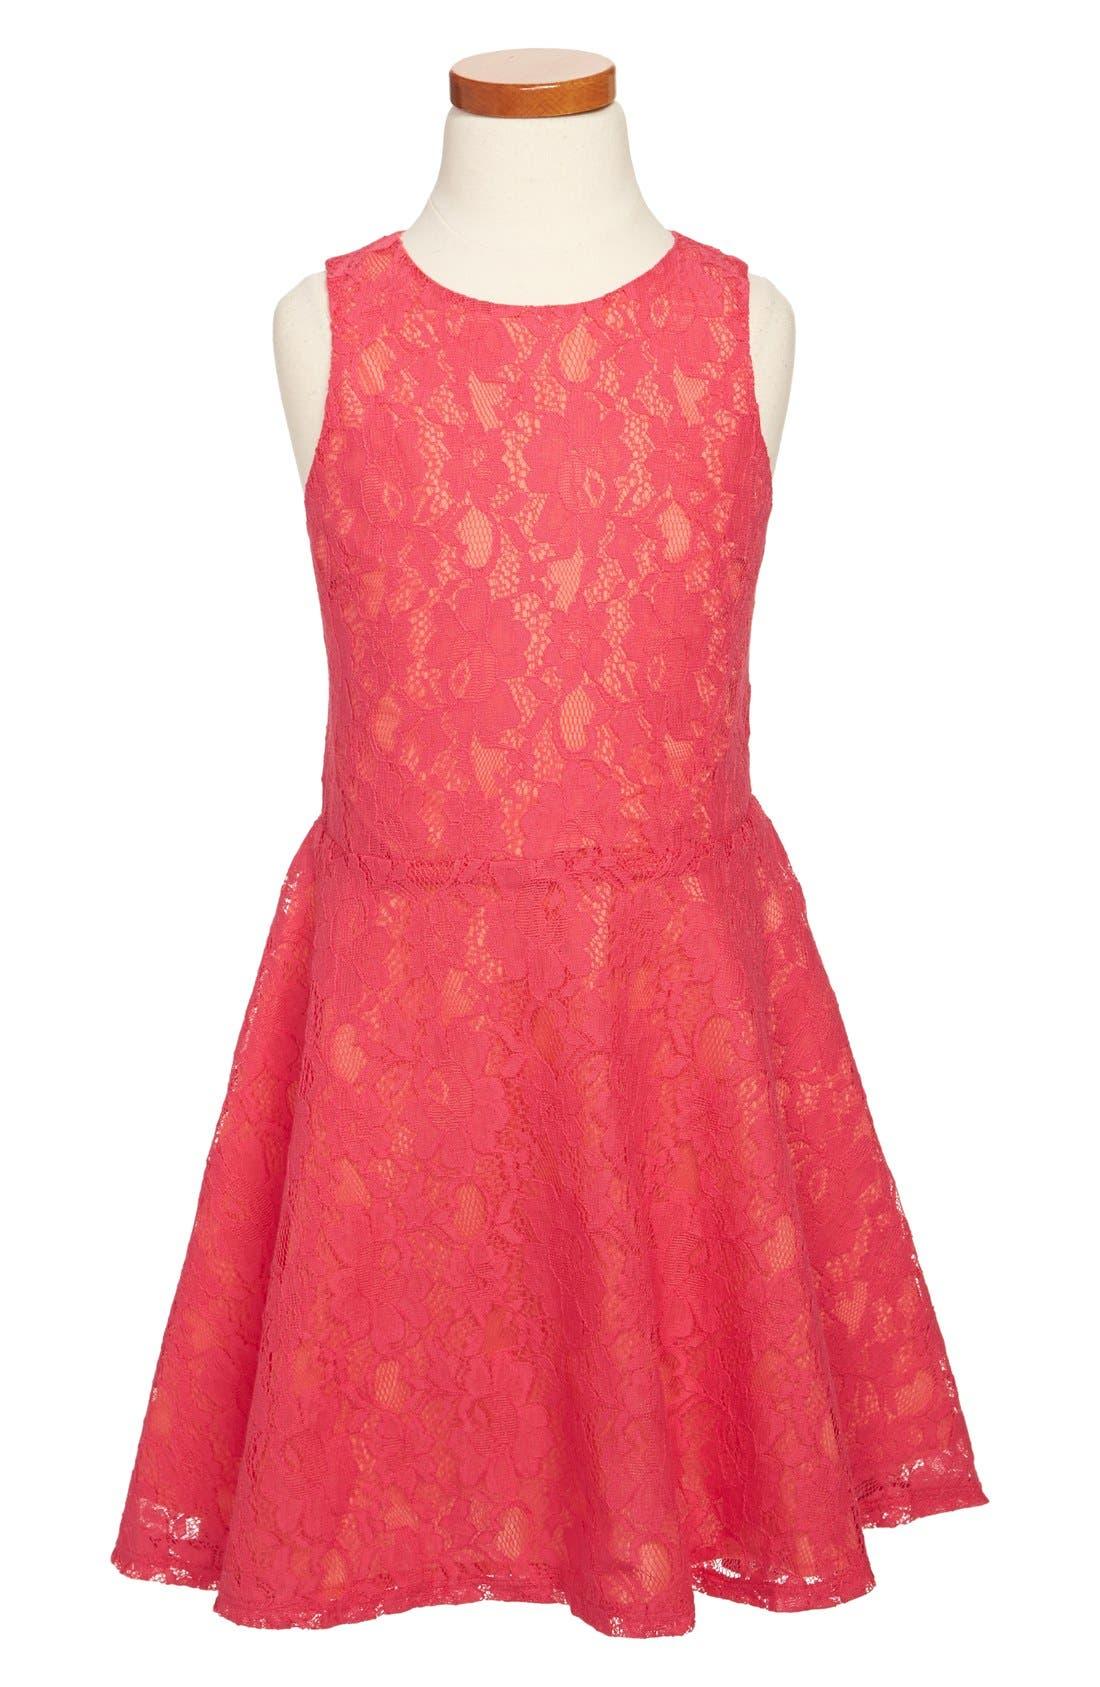 Main Image - Miss Behave 'Sofia' Lace Dress (Big Girls)